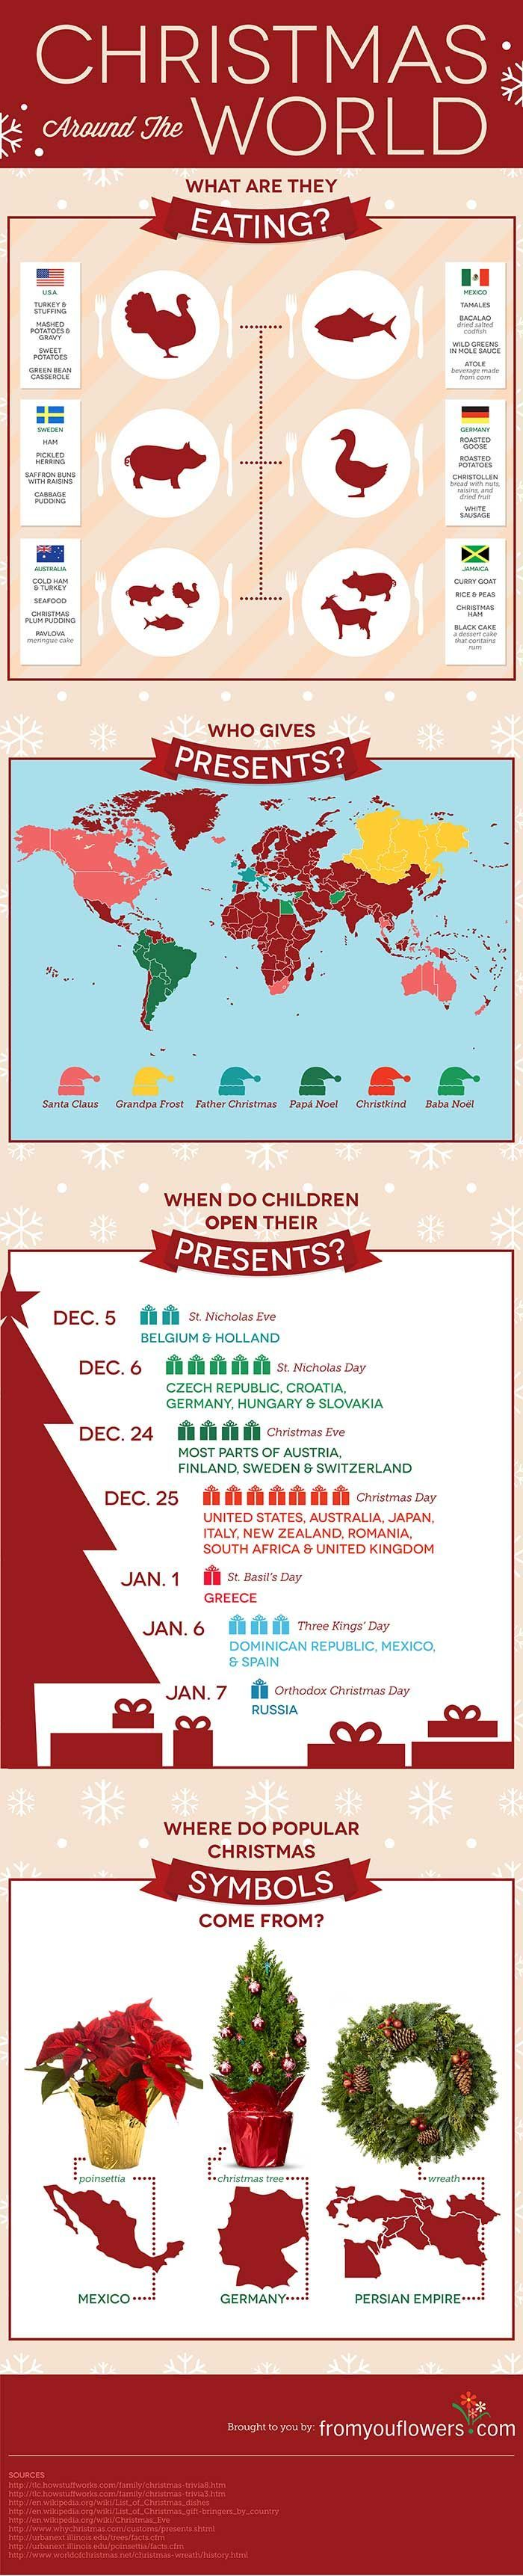 Christmas | Tipsögraphic | More Christmas tips at http://www.tipsographic.com/